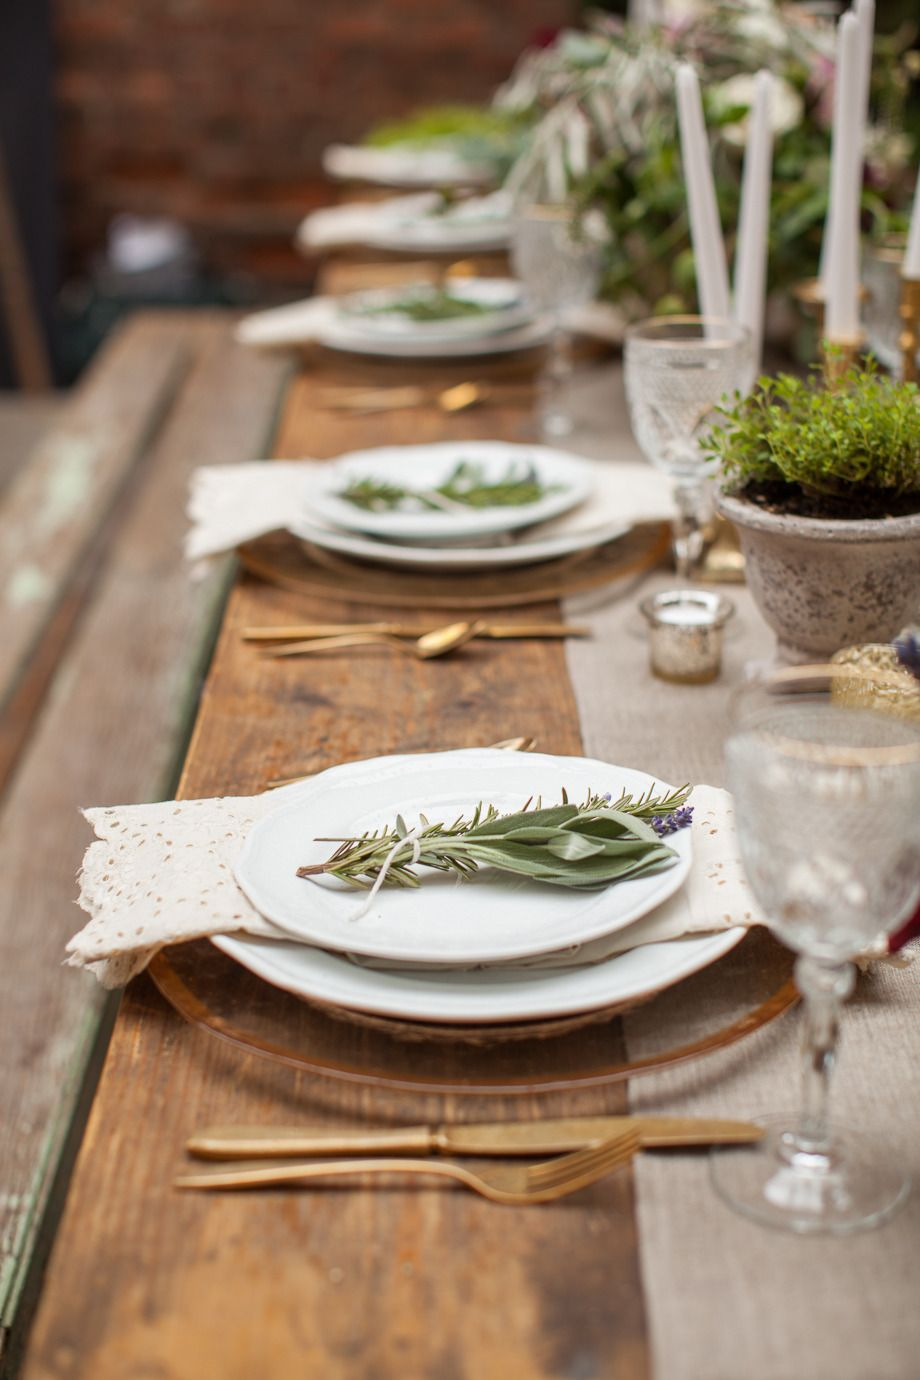 French Farmhouse Inspired Wedding Inspiration in Spokane Washington. Table Setting ... & French Farmhouse Inspired Wedding Inspiration in Spokane Washington ...